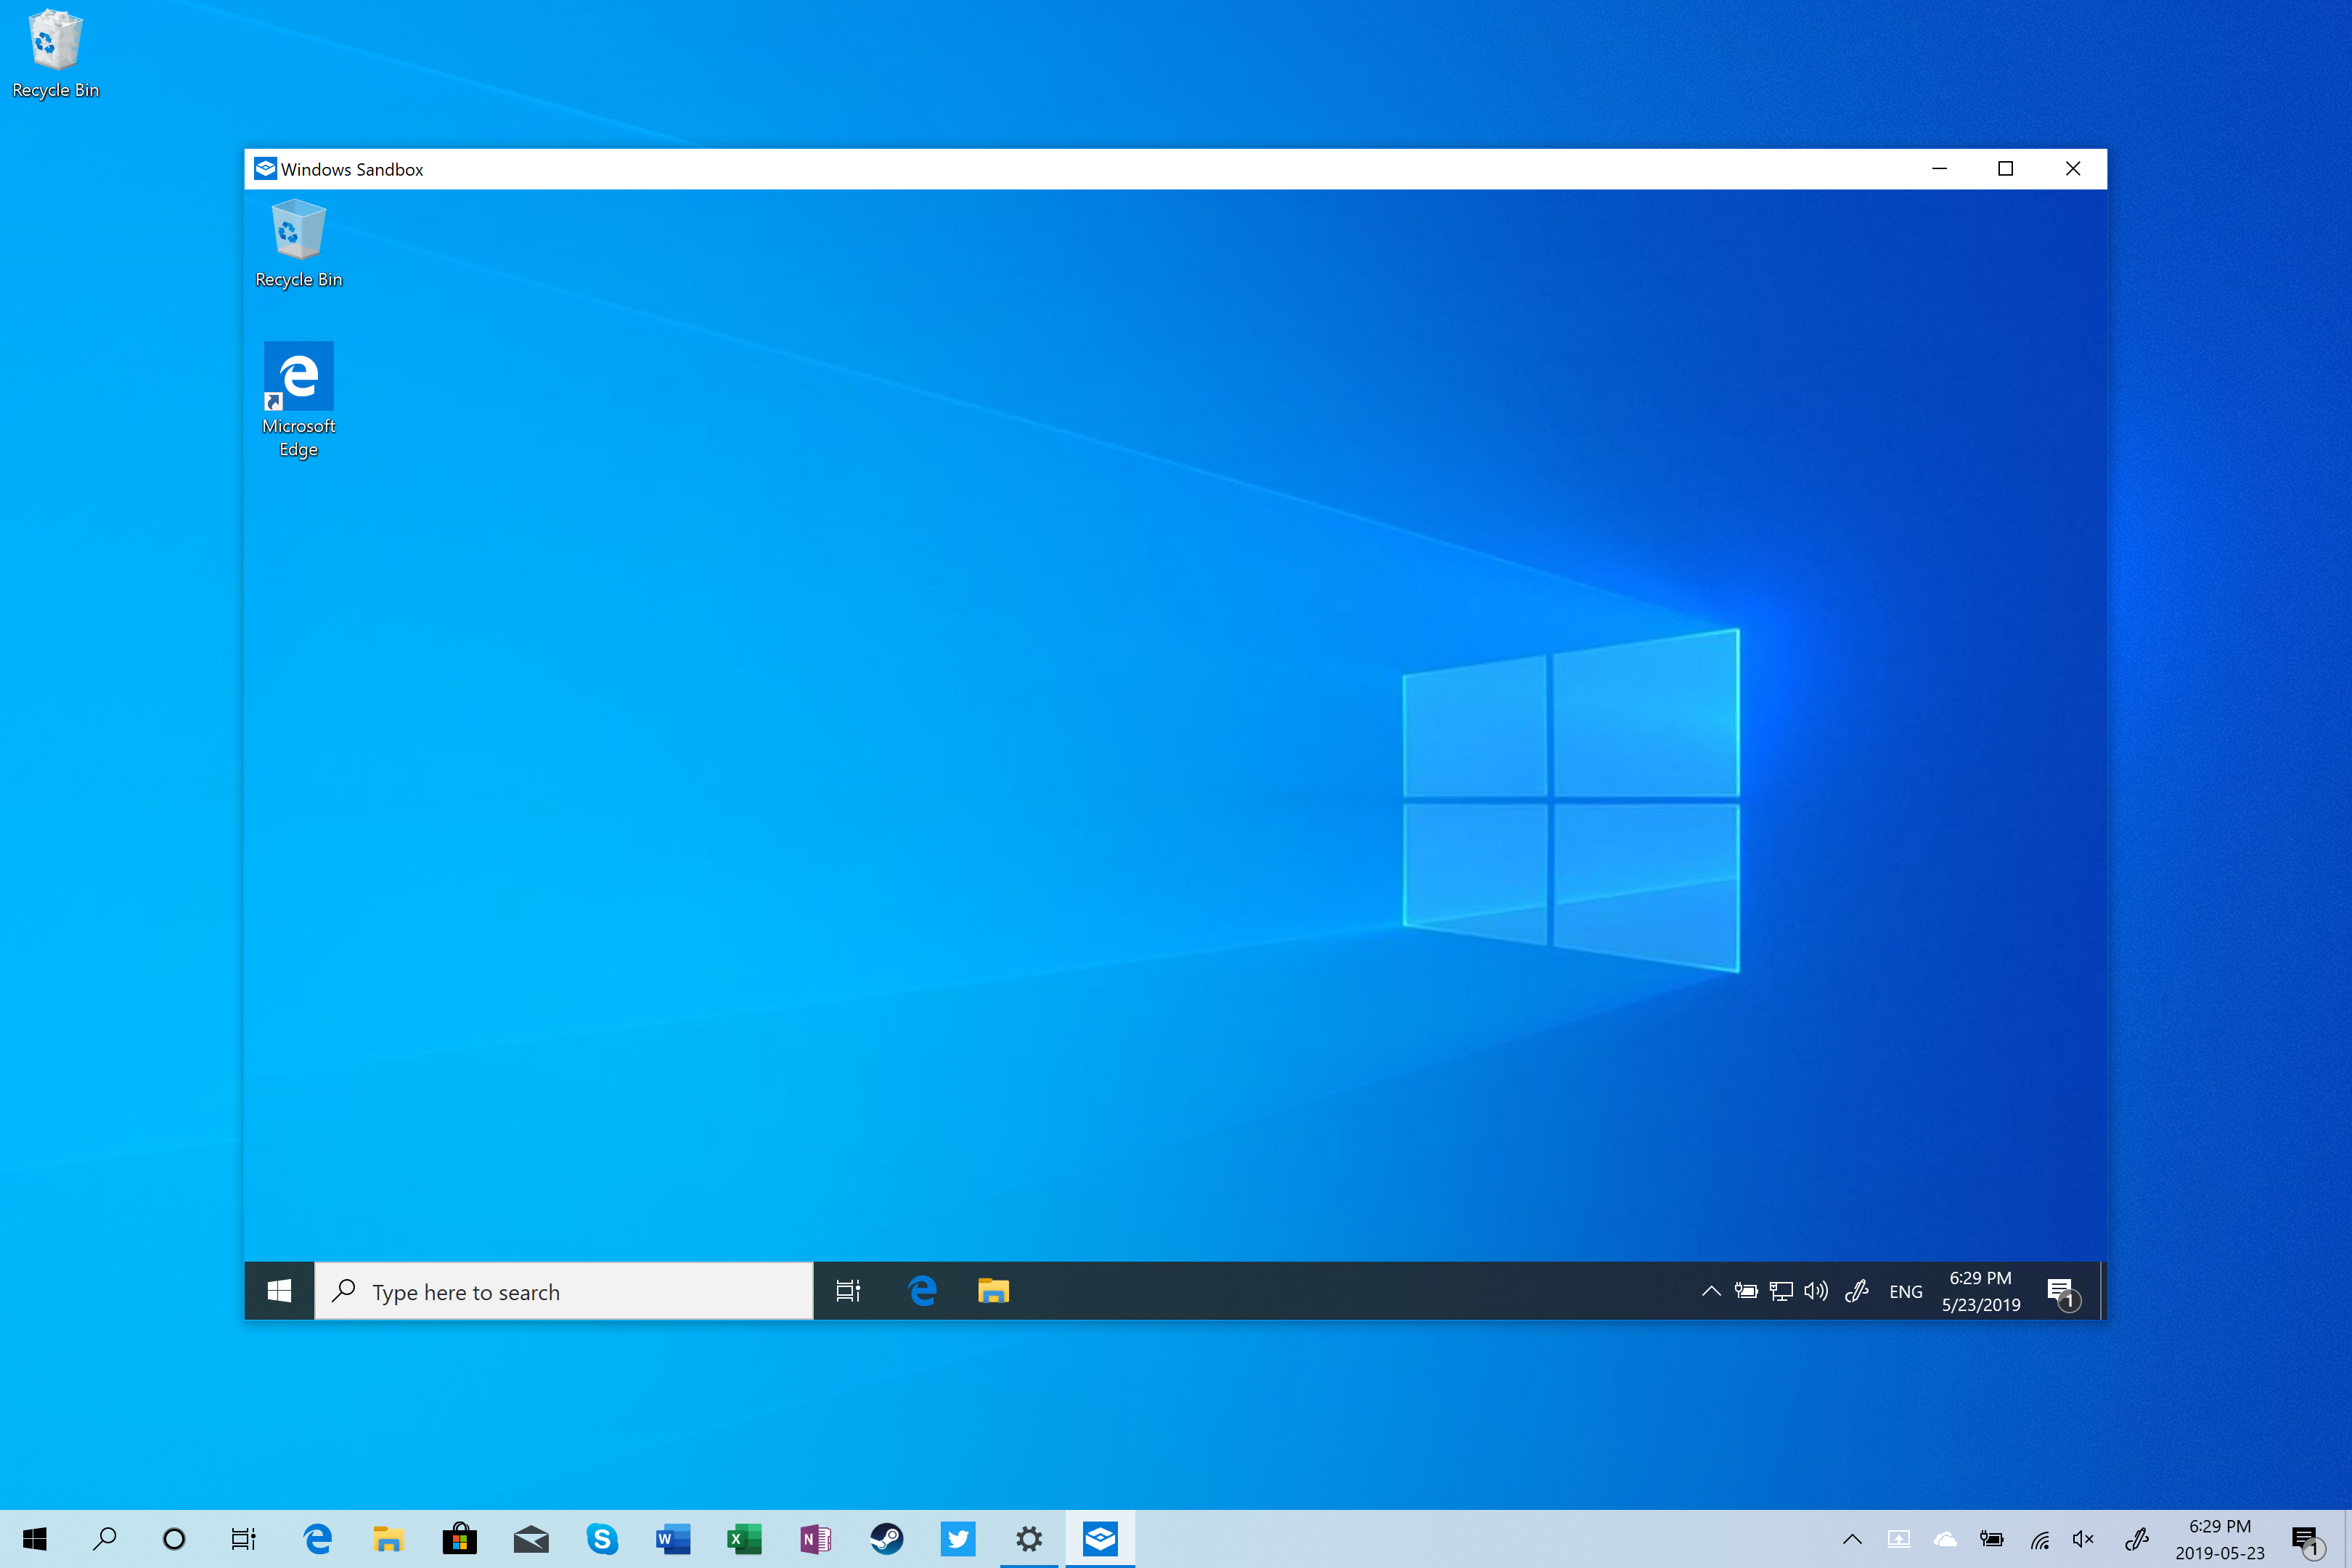 Windows Sandbox - Windows 10 May 2019 Update Feature Focus: Light